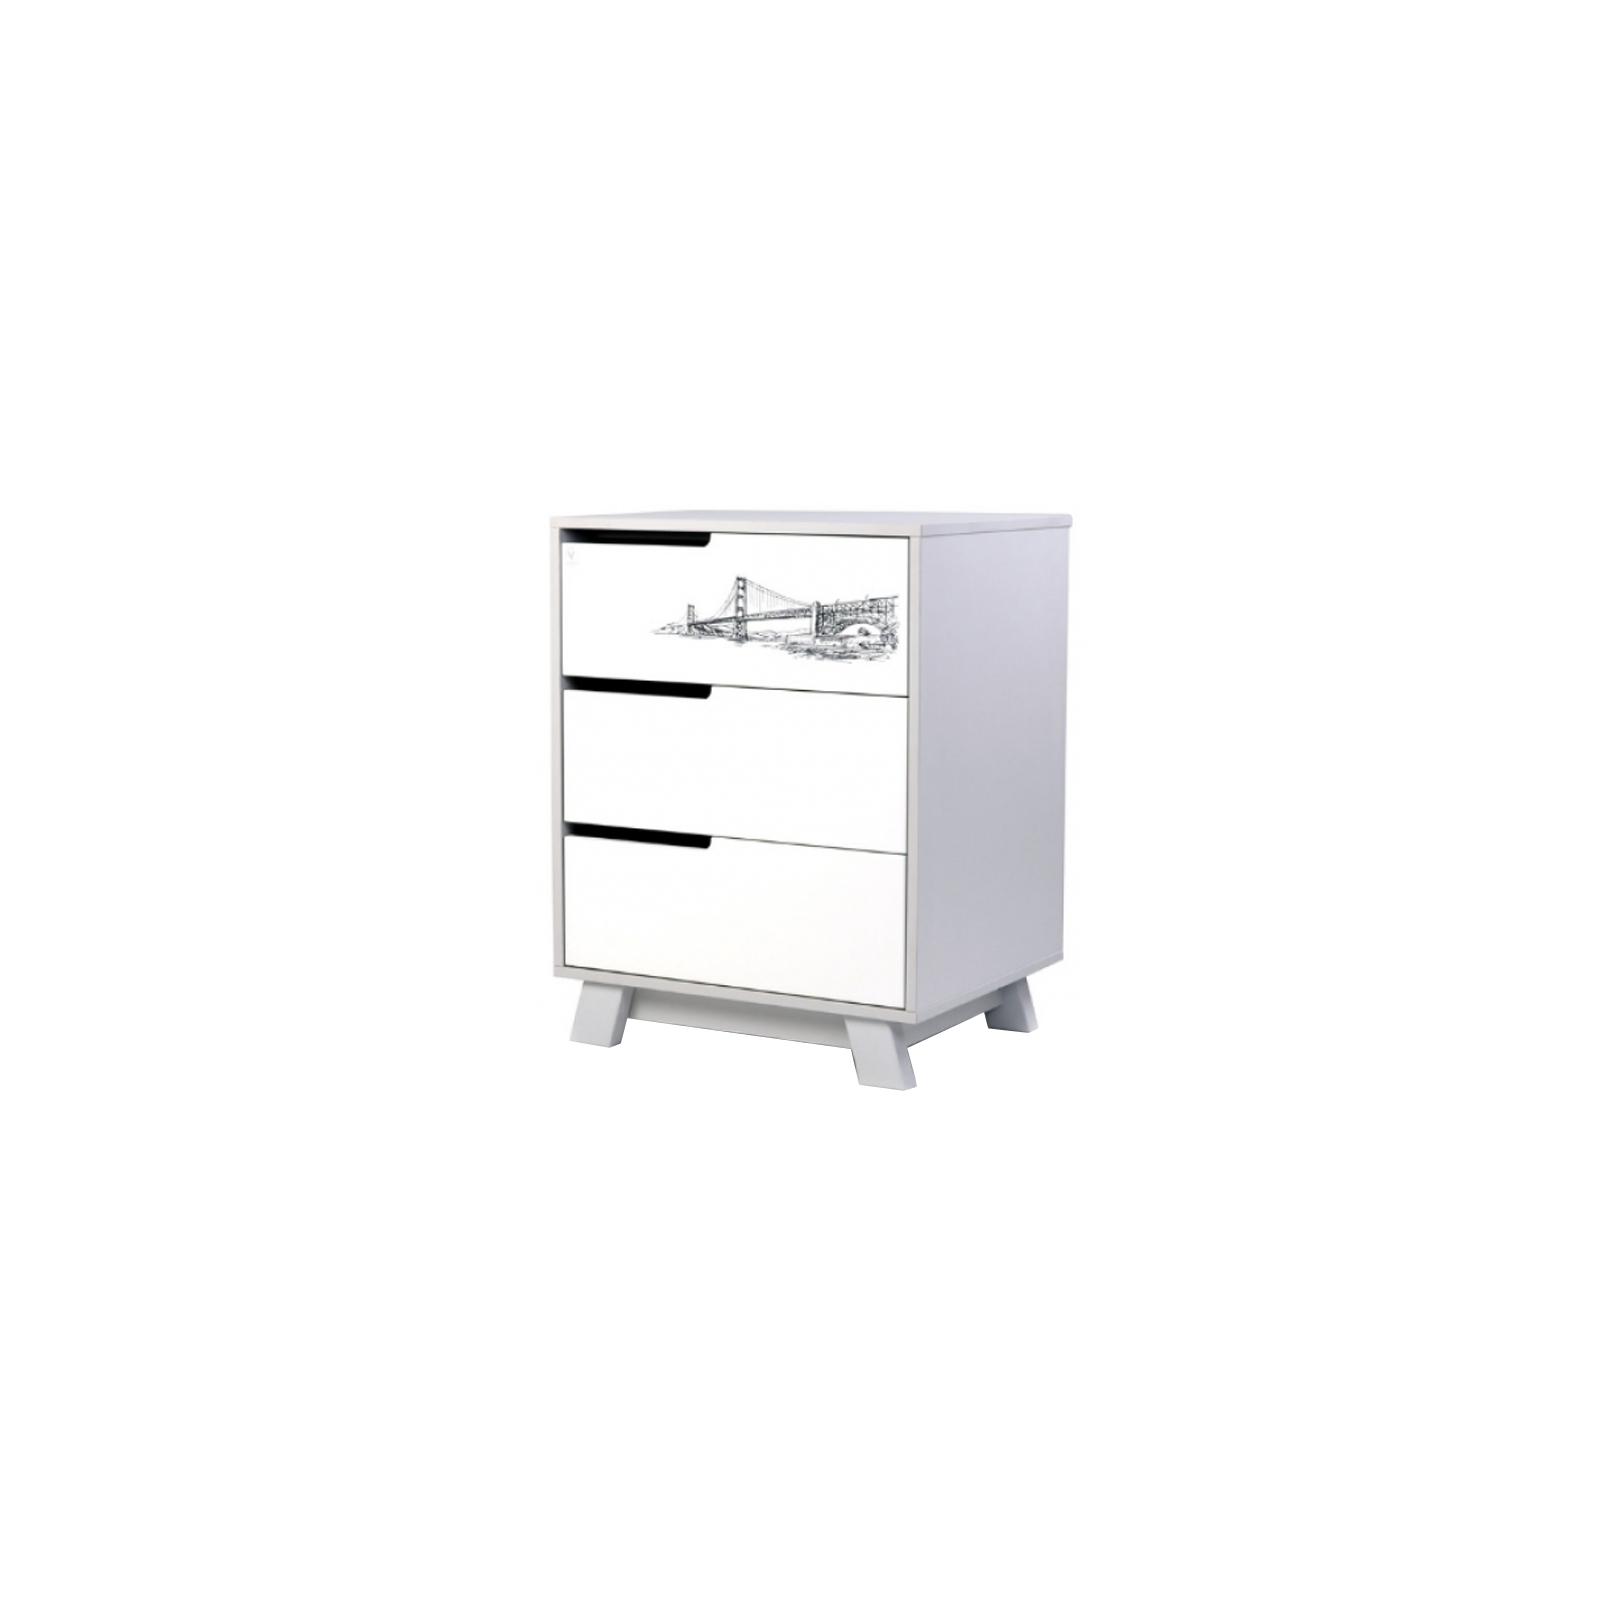 Комод-пеленатор Верес (600) Manhattan бело-серый Tattou (32.2.321.1.17)